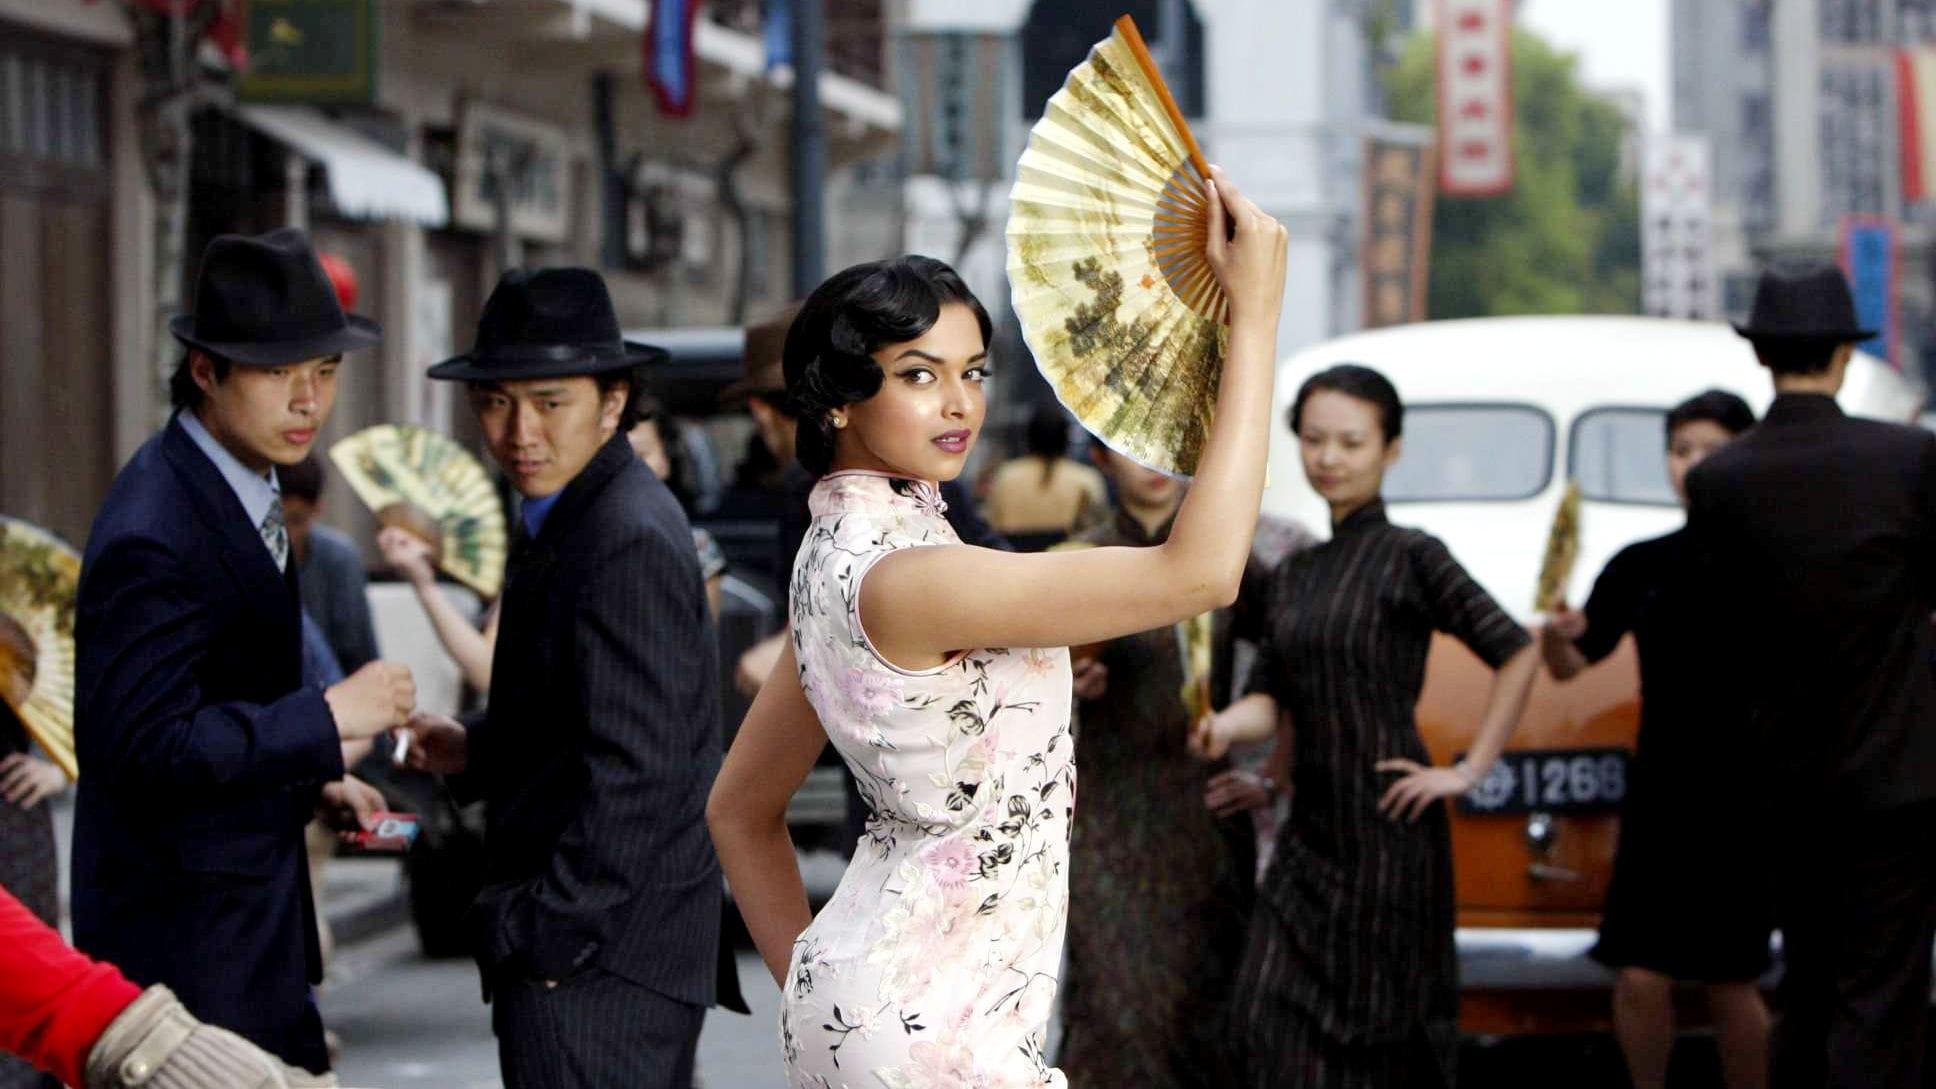 chandni chowk to china 2009 full movie watch online free